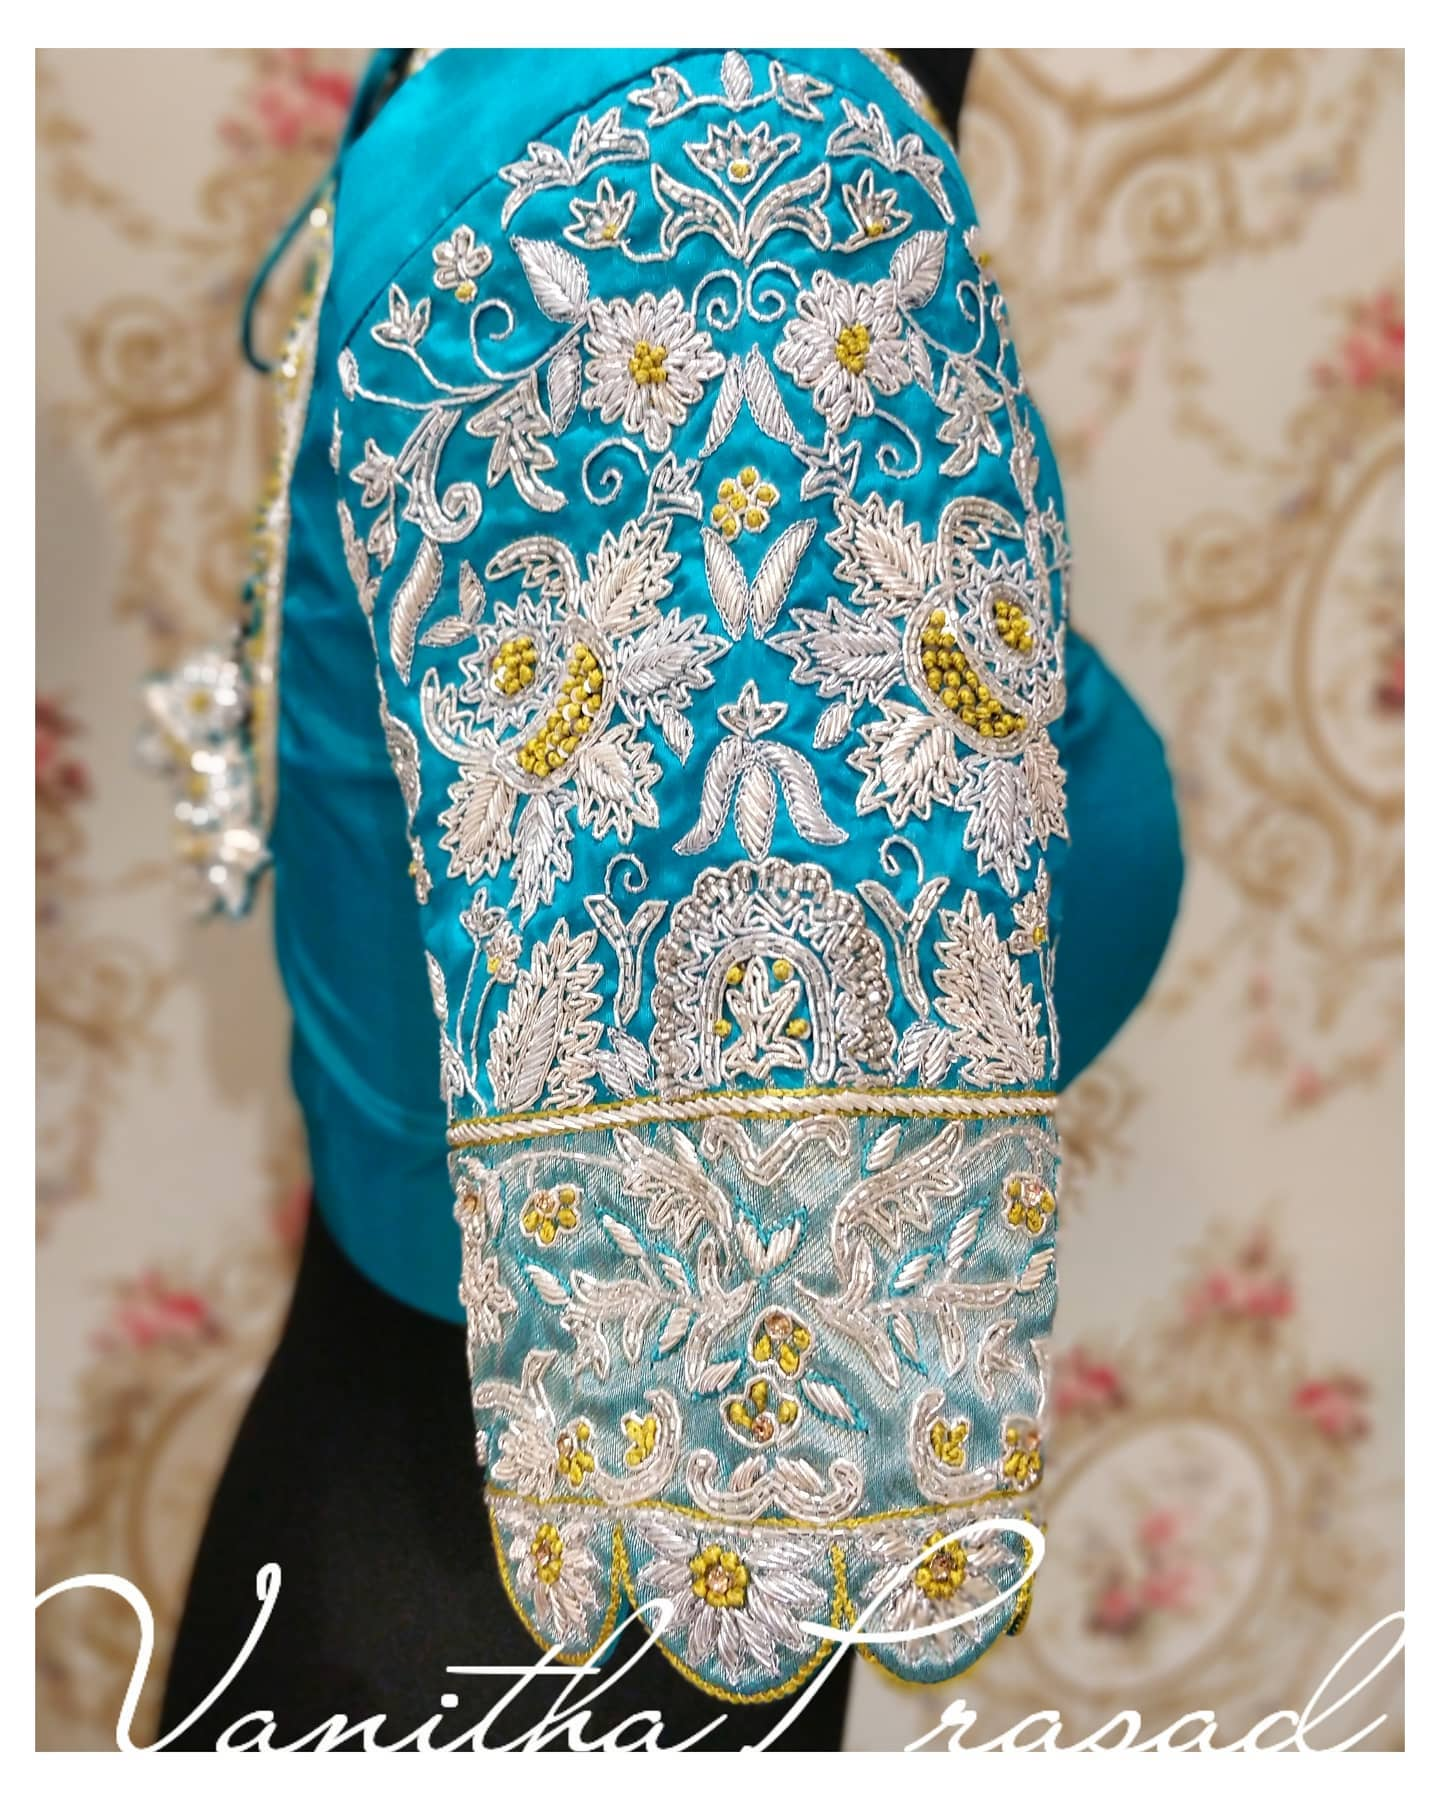 Silver Zardozi Blouse !! Beautifully crafted wedding blouse with silver zardozi matching the saree's zari weave. 2021-06-15